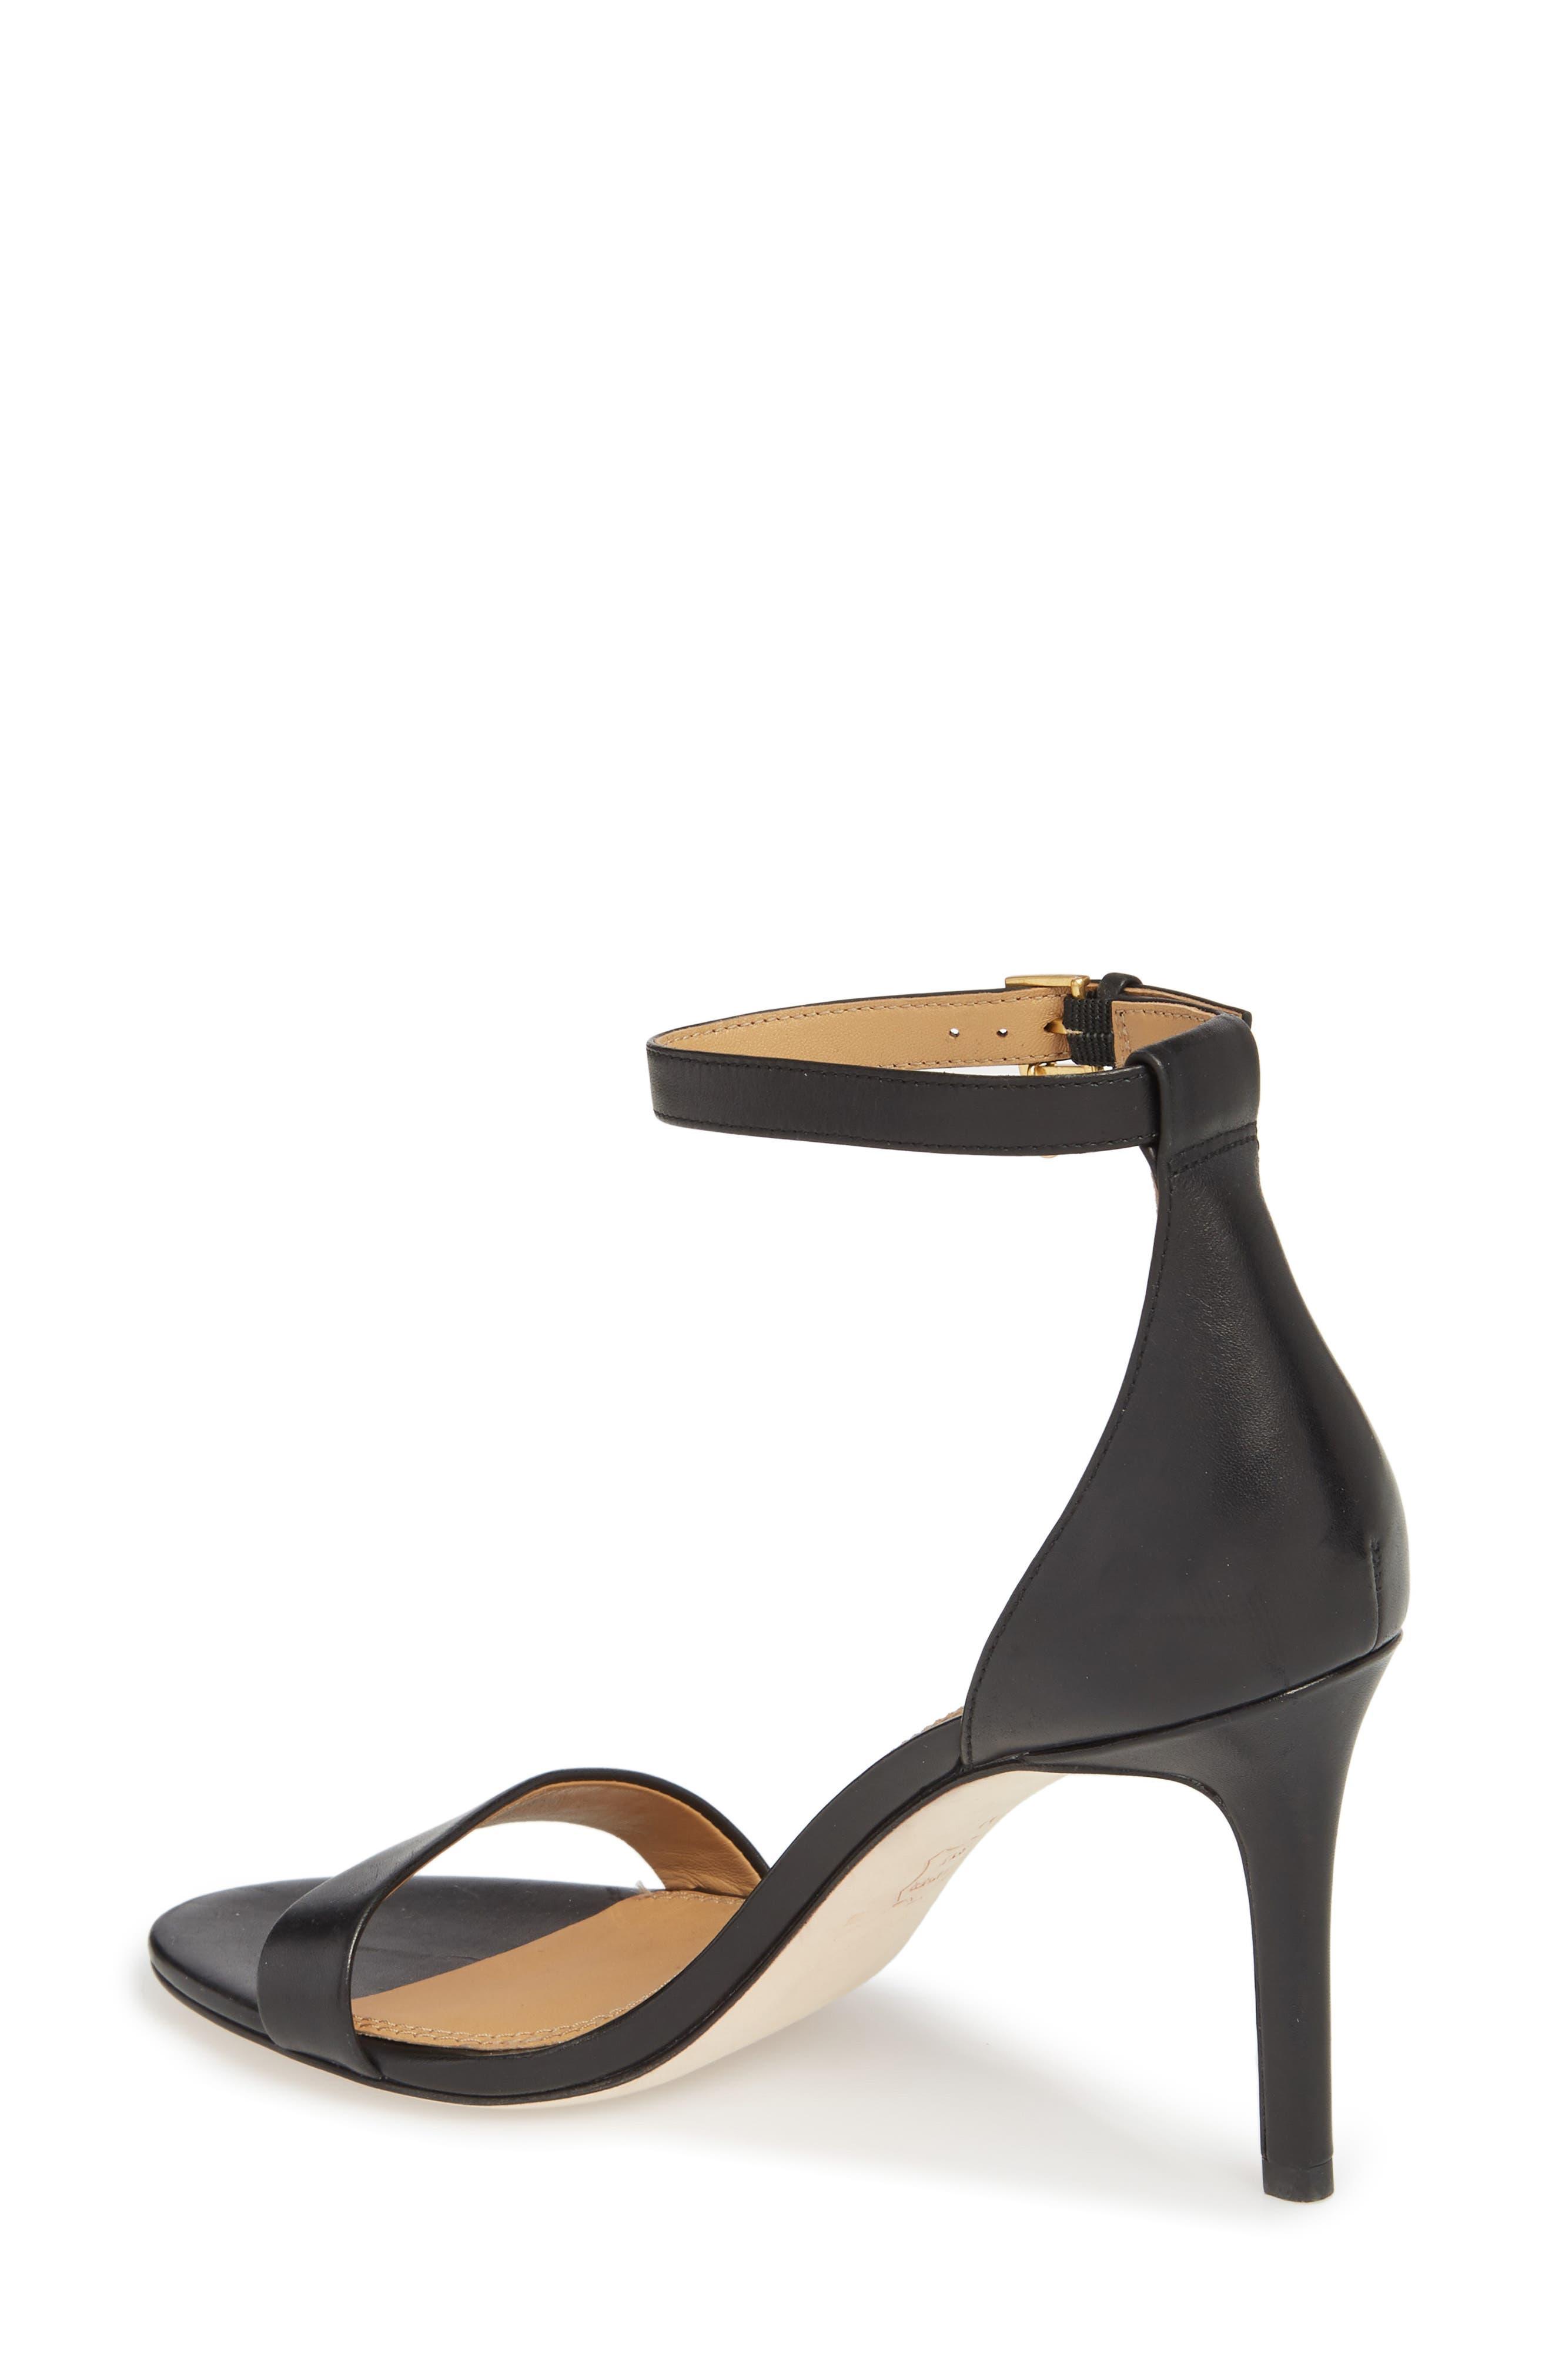 Ellie Ankle Strap Sandal,                             Alternate thumbnail 2, color,                             Black Leather